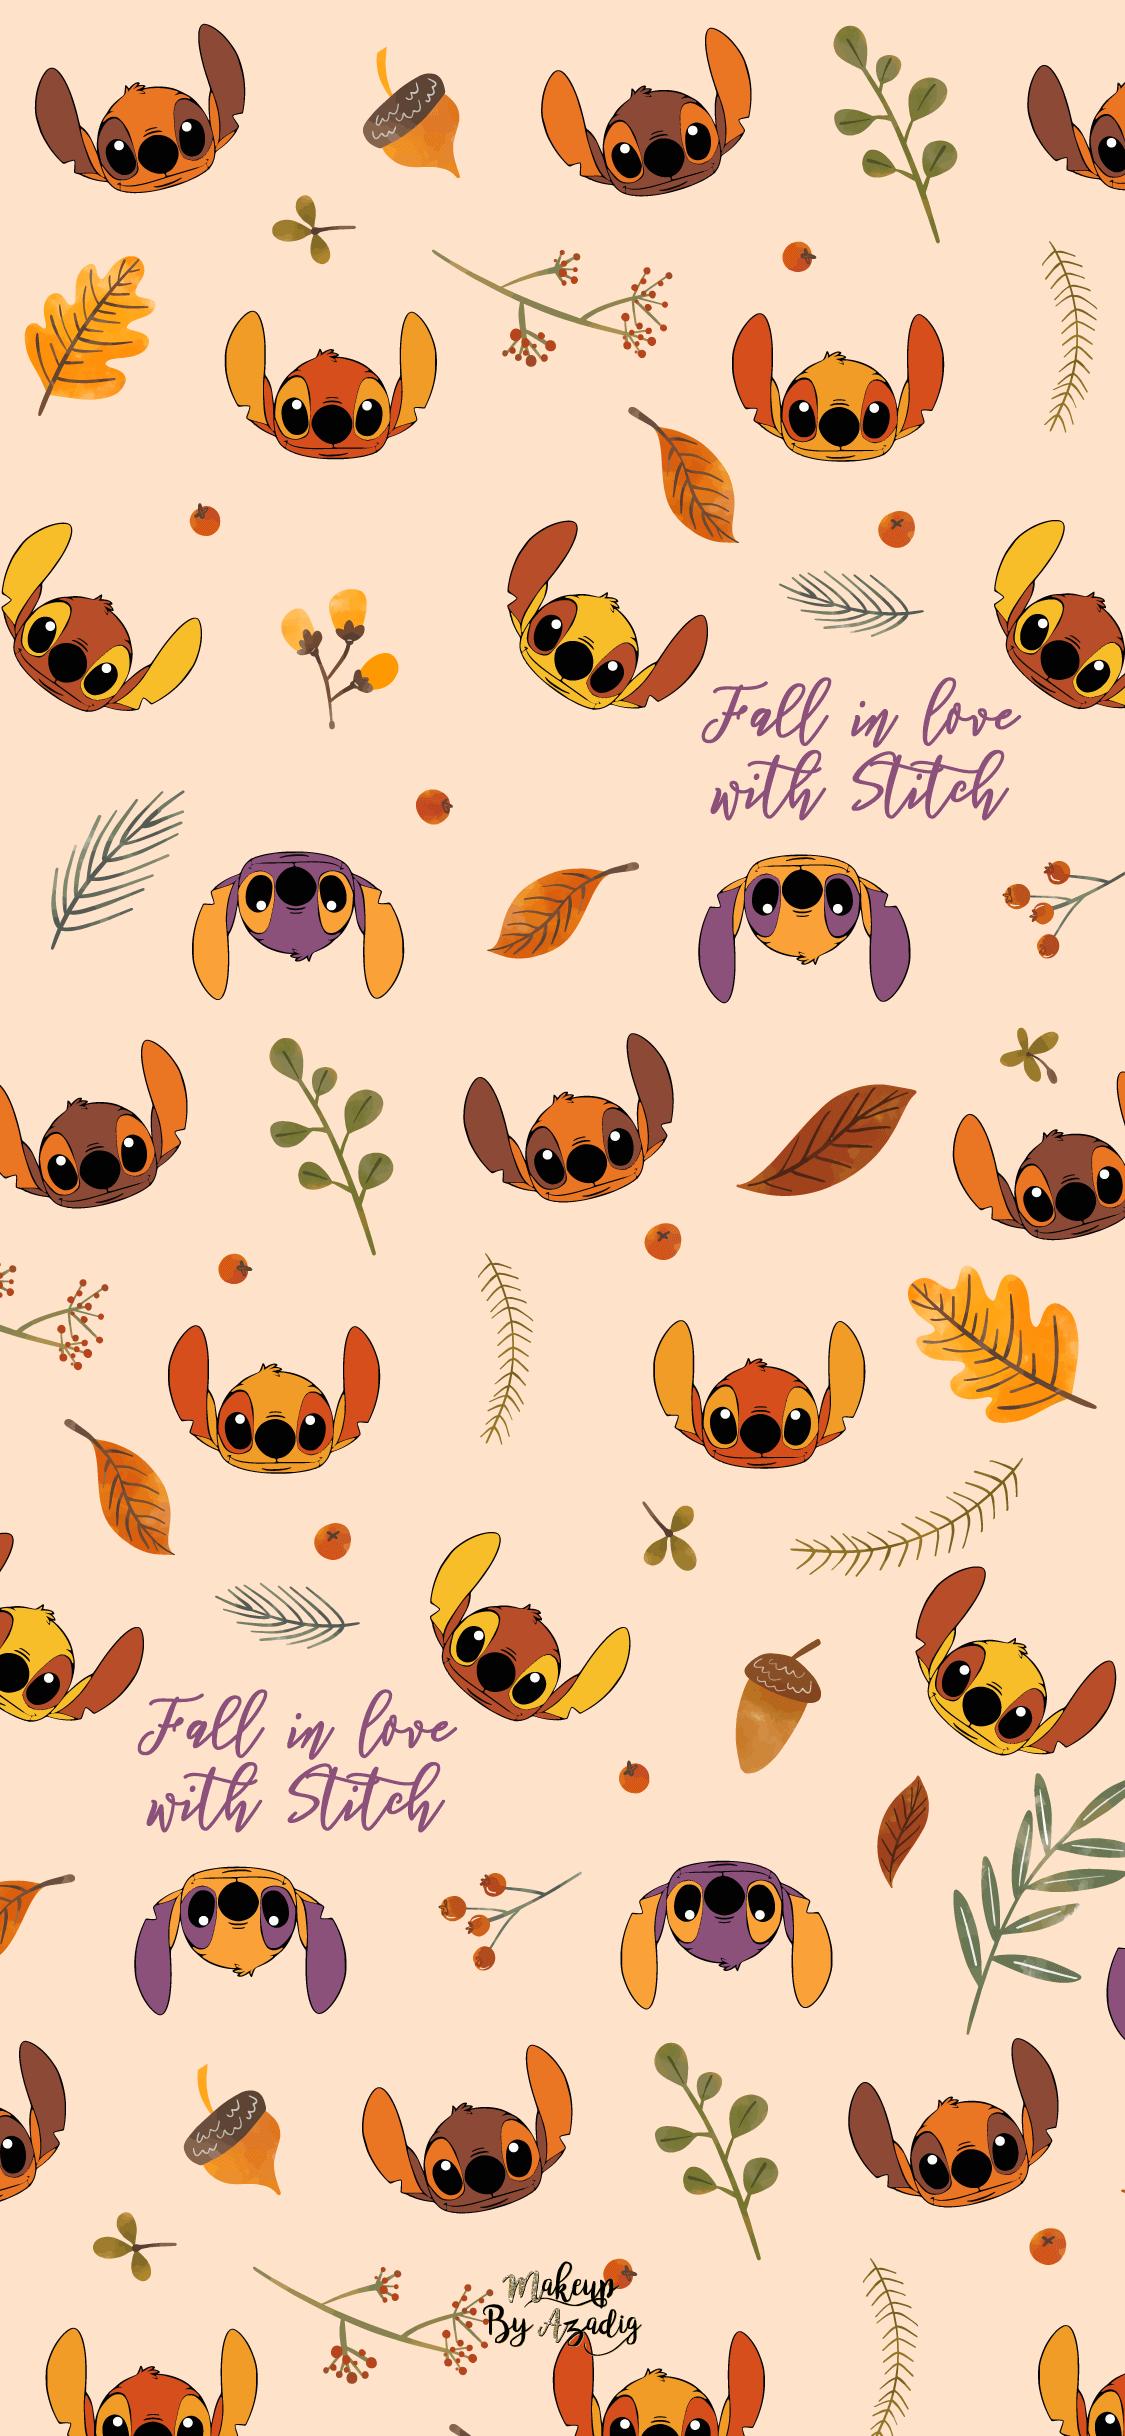 Fond Decran Wallpaper Stitch Autumn Automne Fallinlove Disney Iphone X Makeupbyazadig Tenda Wallpaper Iphone Disney Iphone Wallpaper Fall Wallpaper Iphone Cute